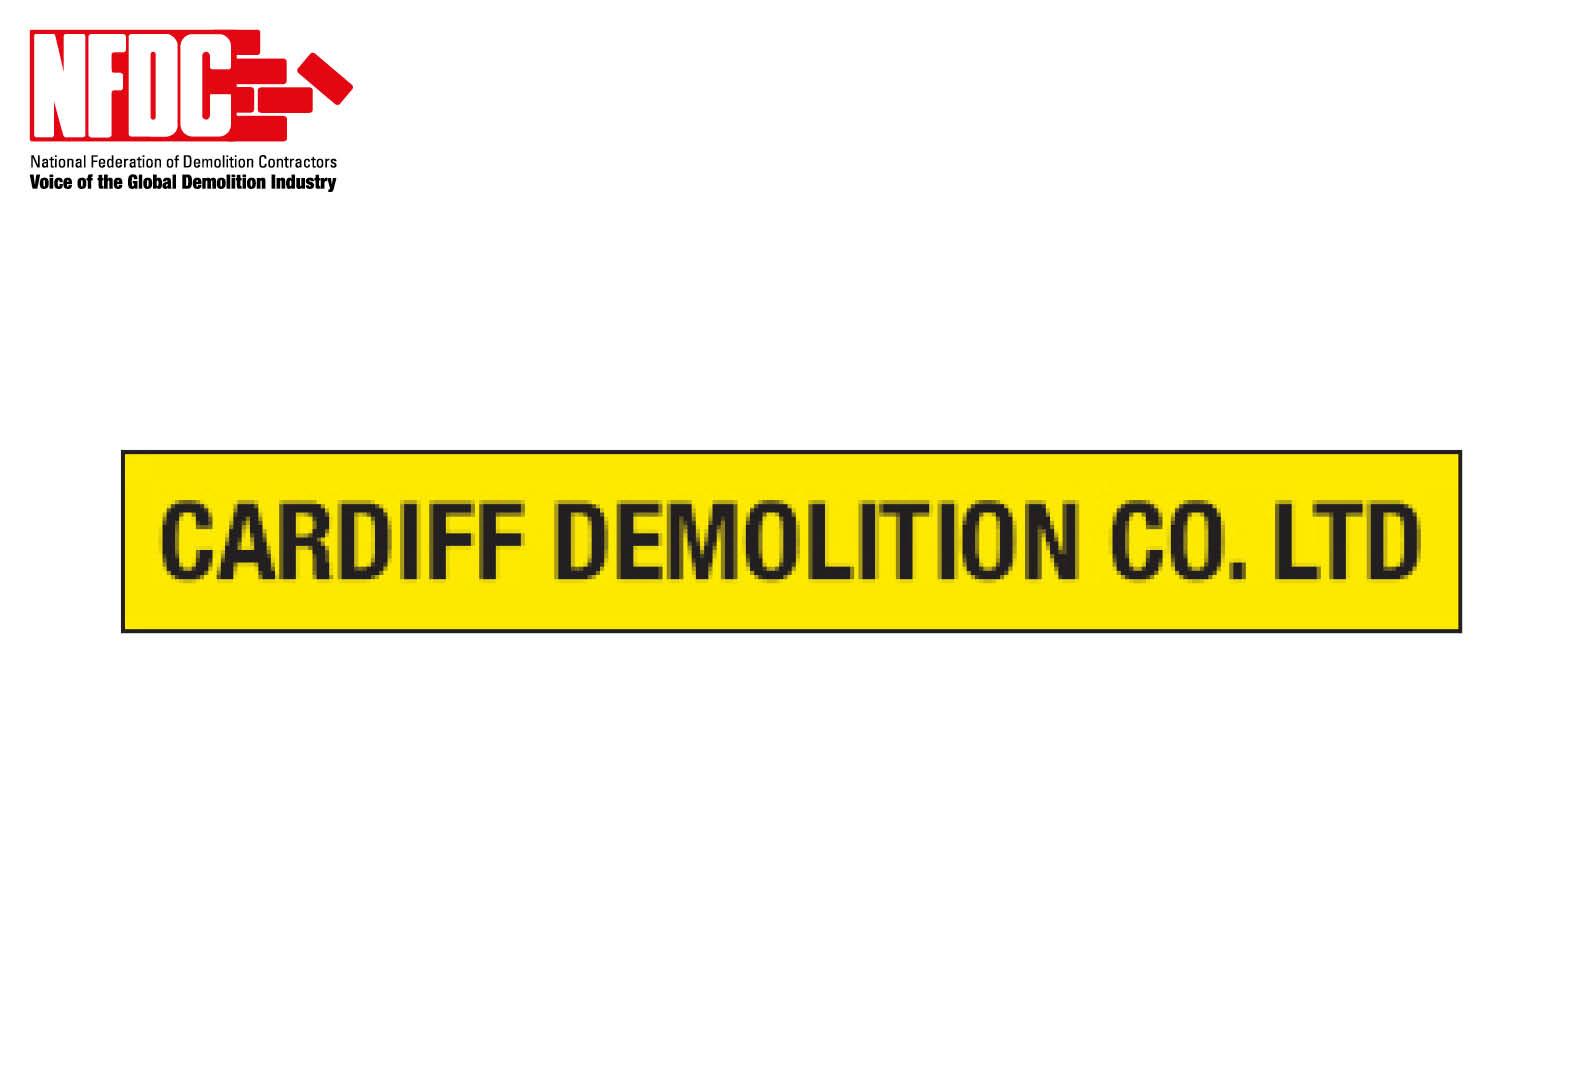 Cardiff Demolition